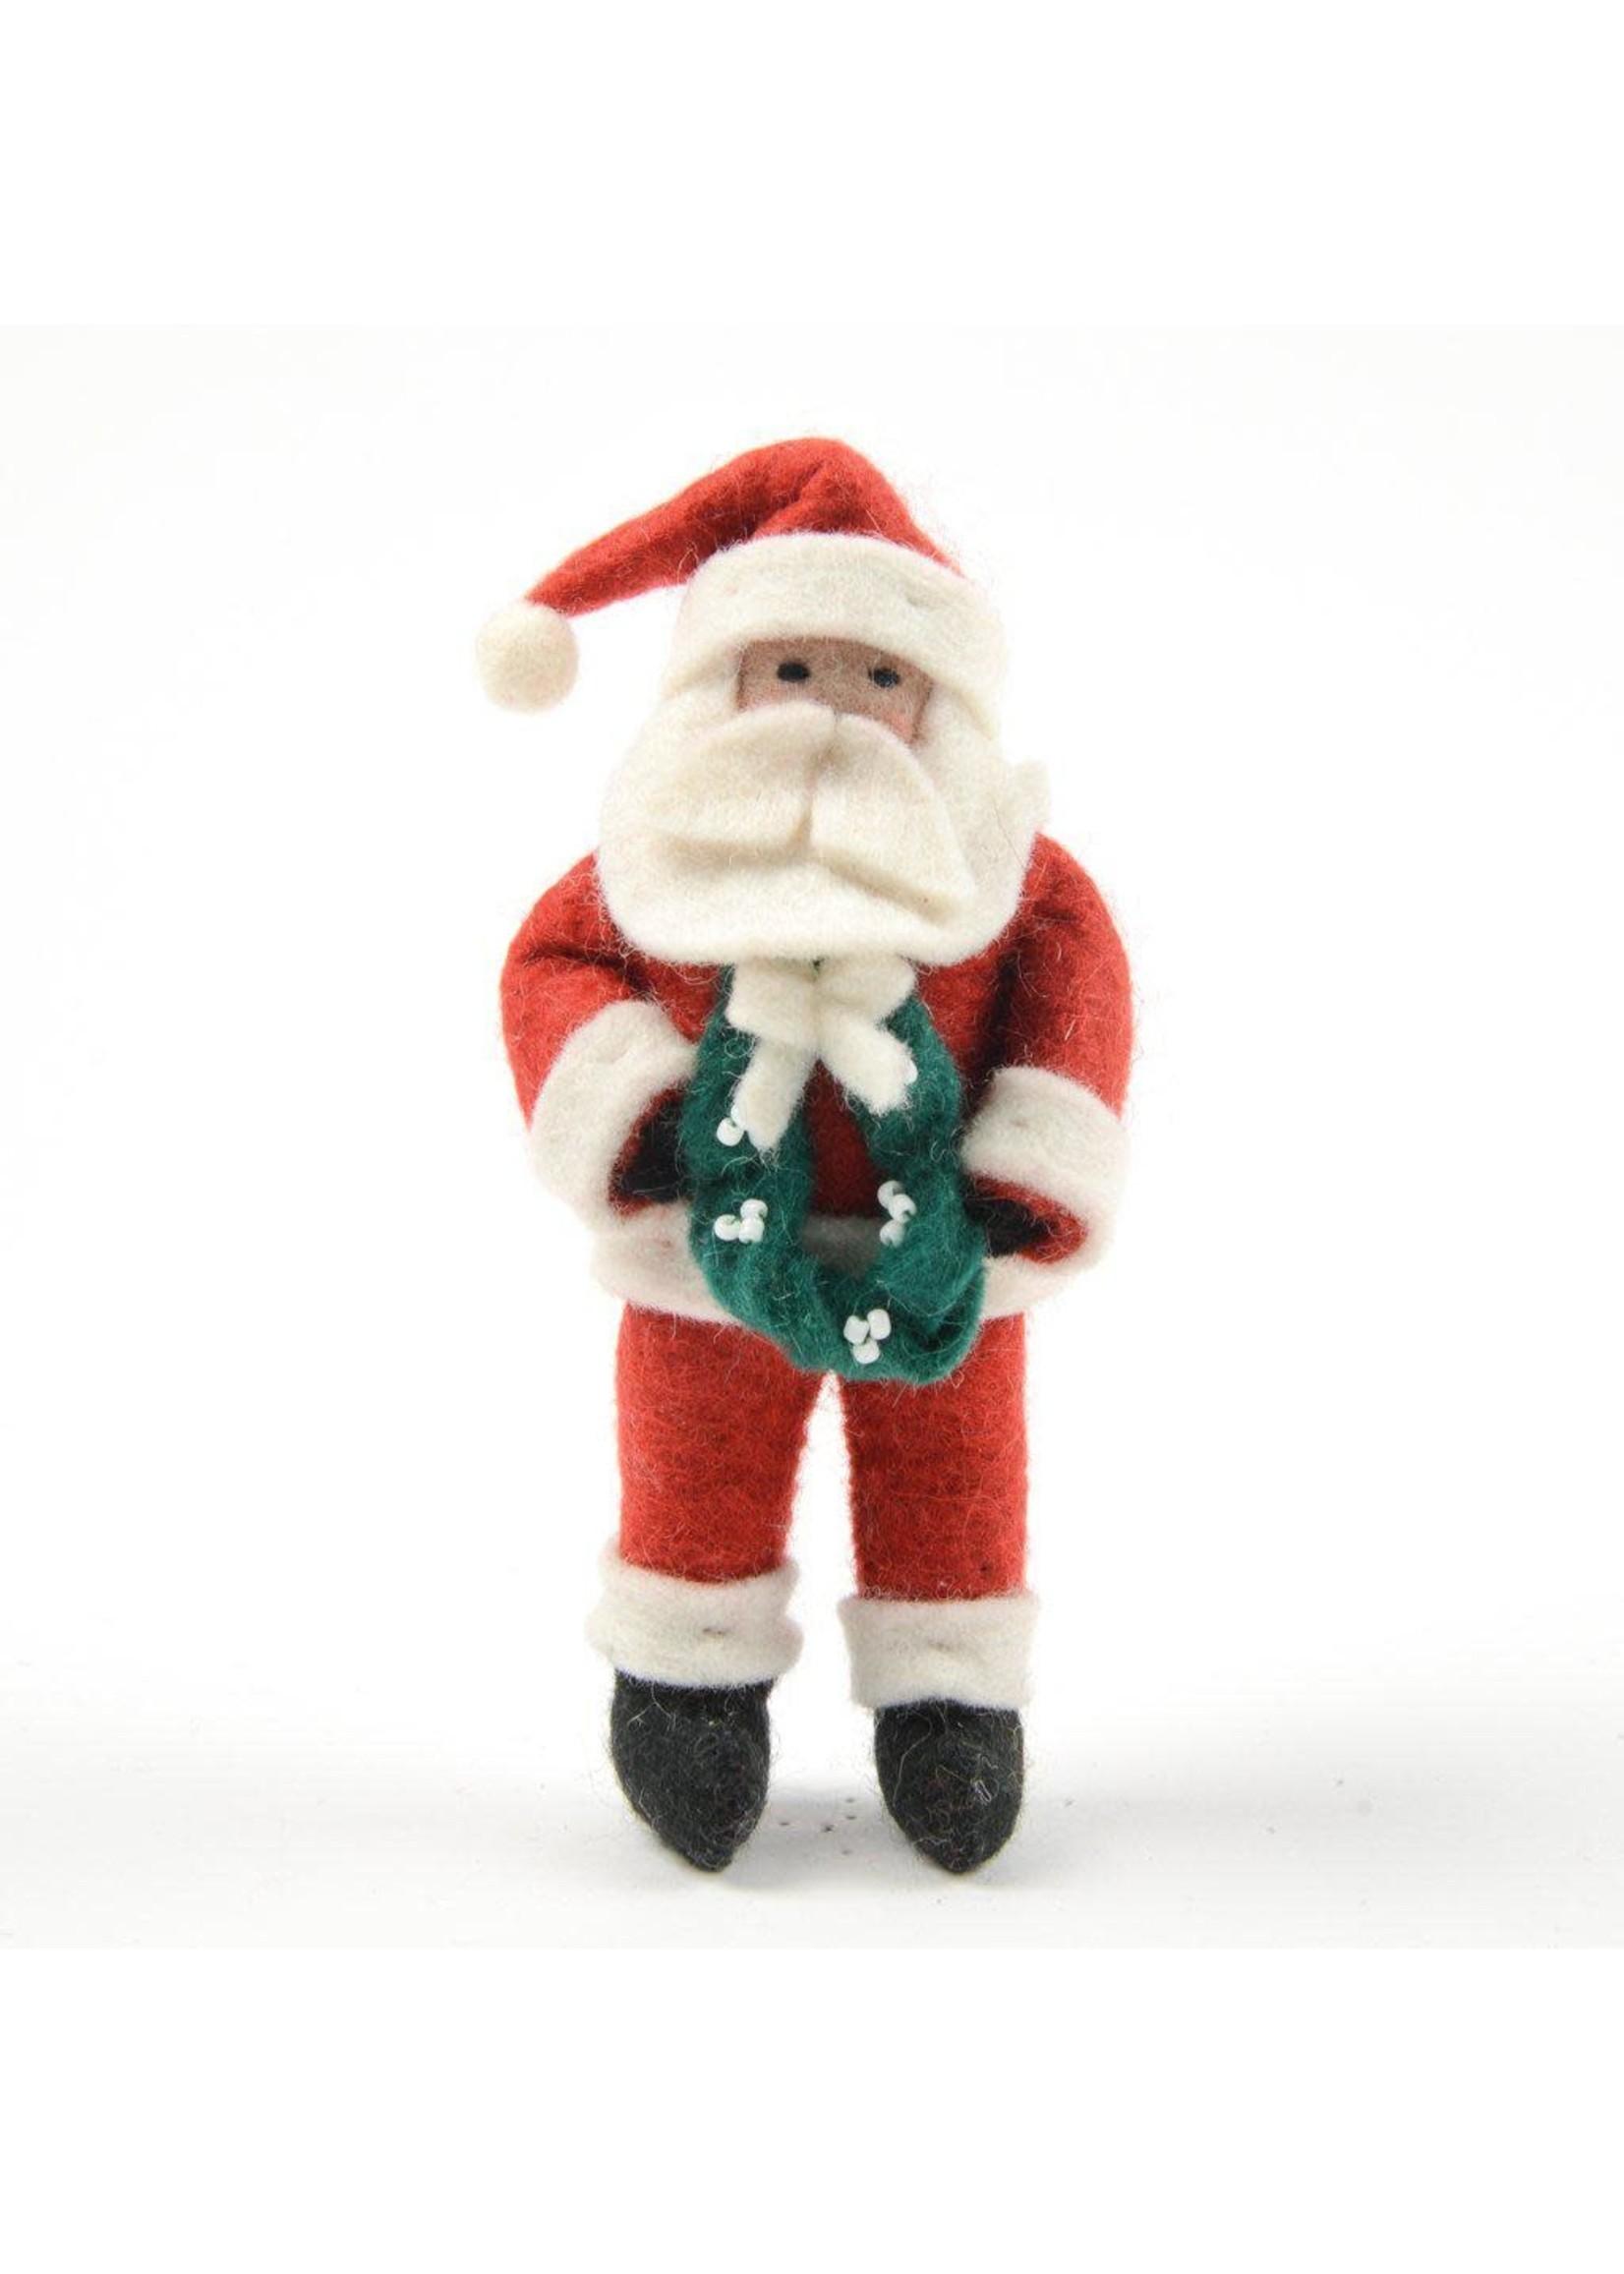 Ornament - Jolly Season Santa with Wreath